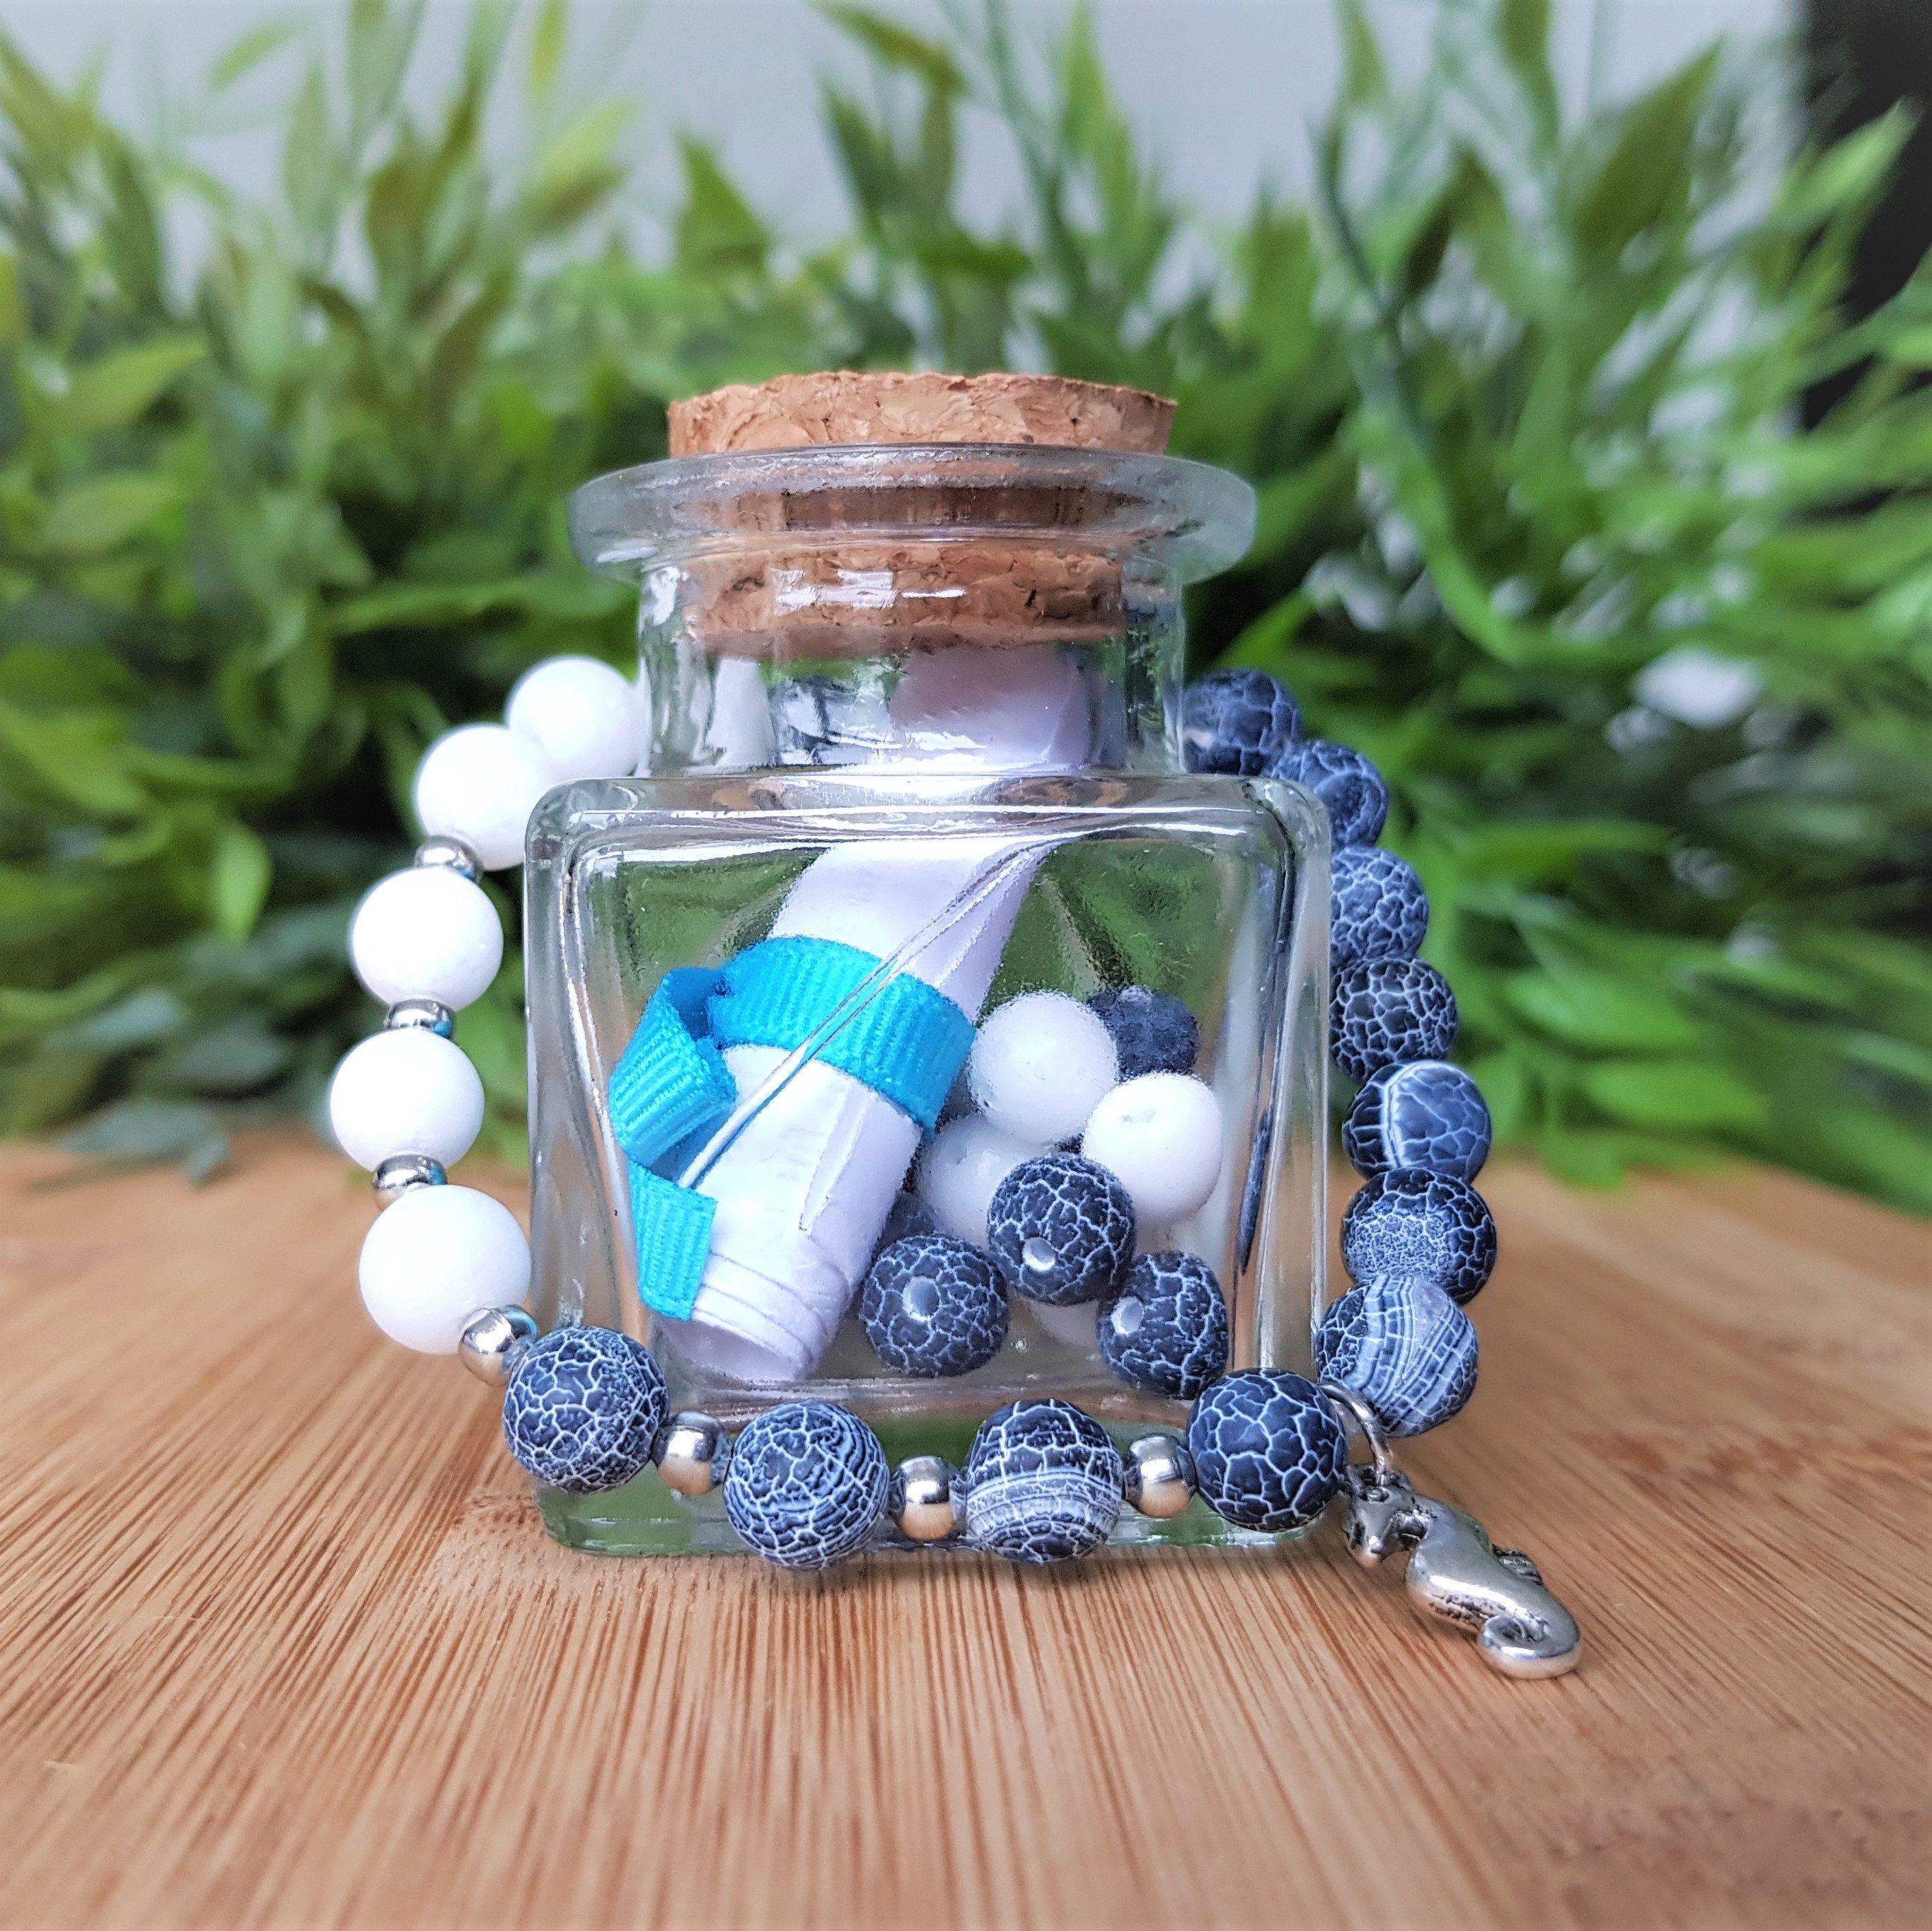 Wonderbaarlijk DIY Armband Kit, Zelf Juwelen Maken, DIY Pakket Armband HK-07